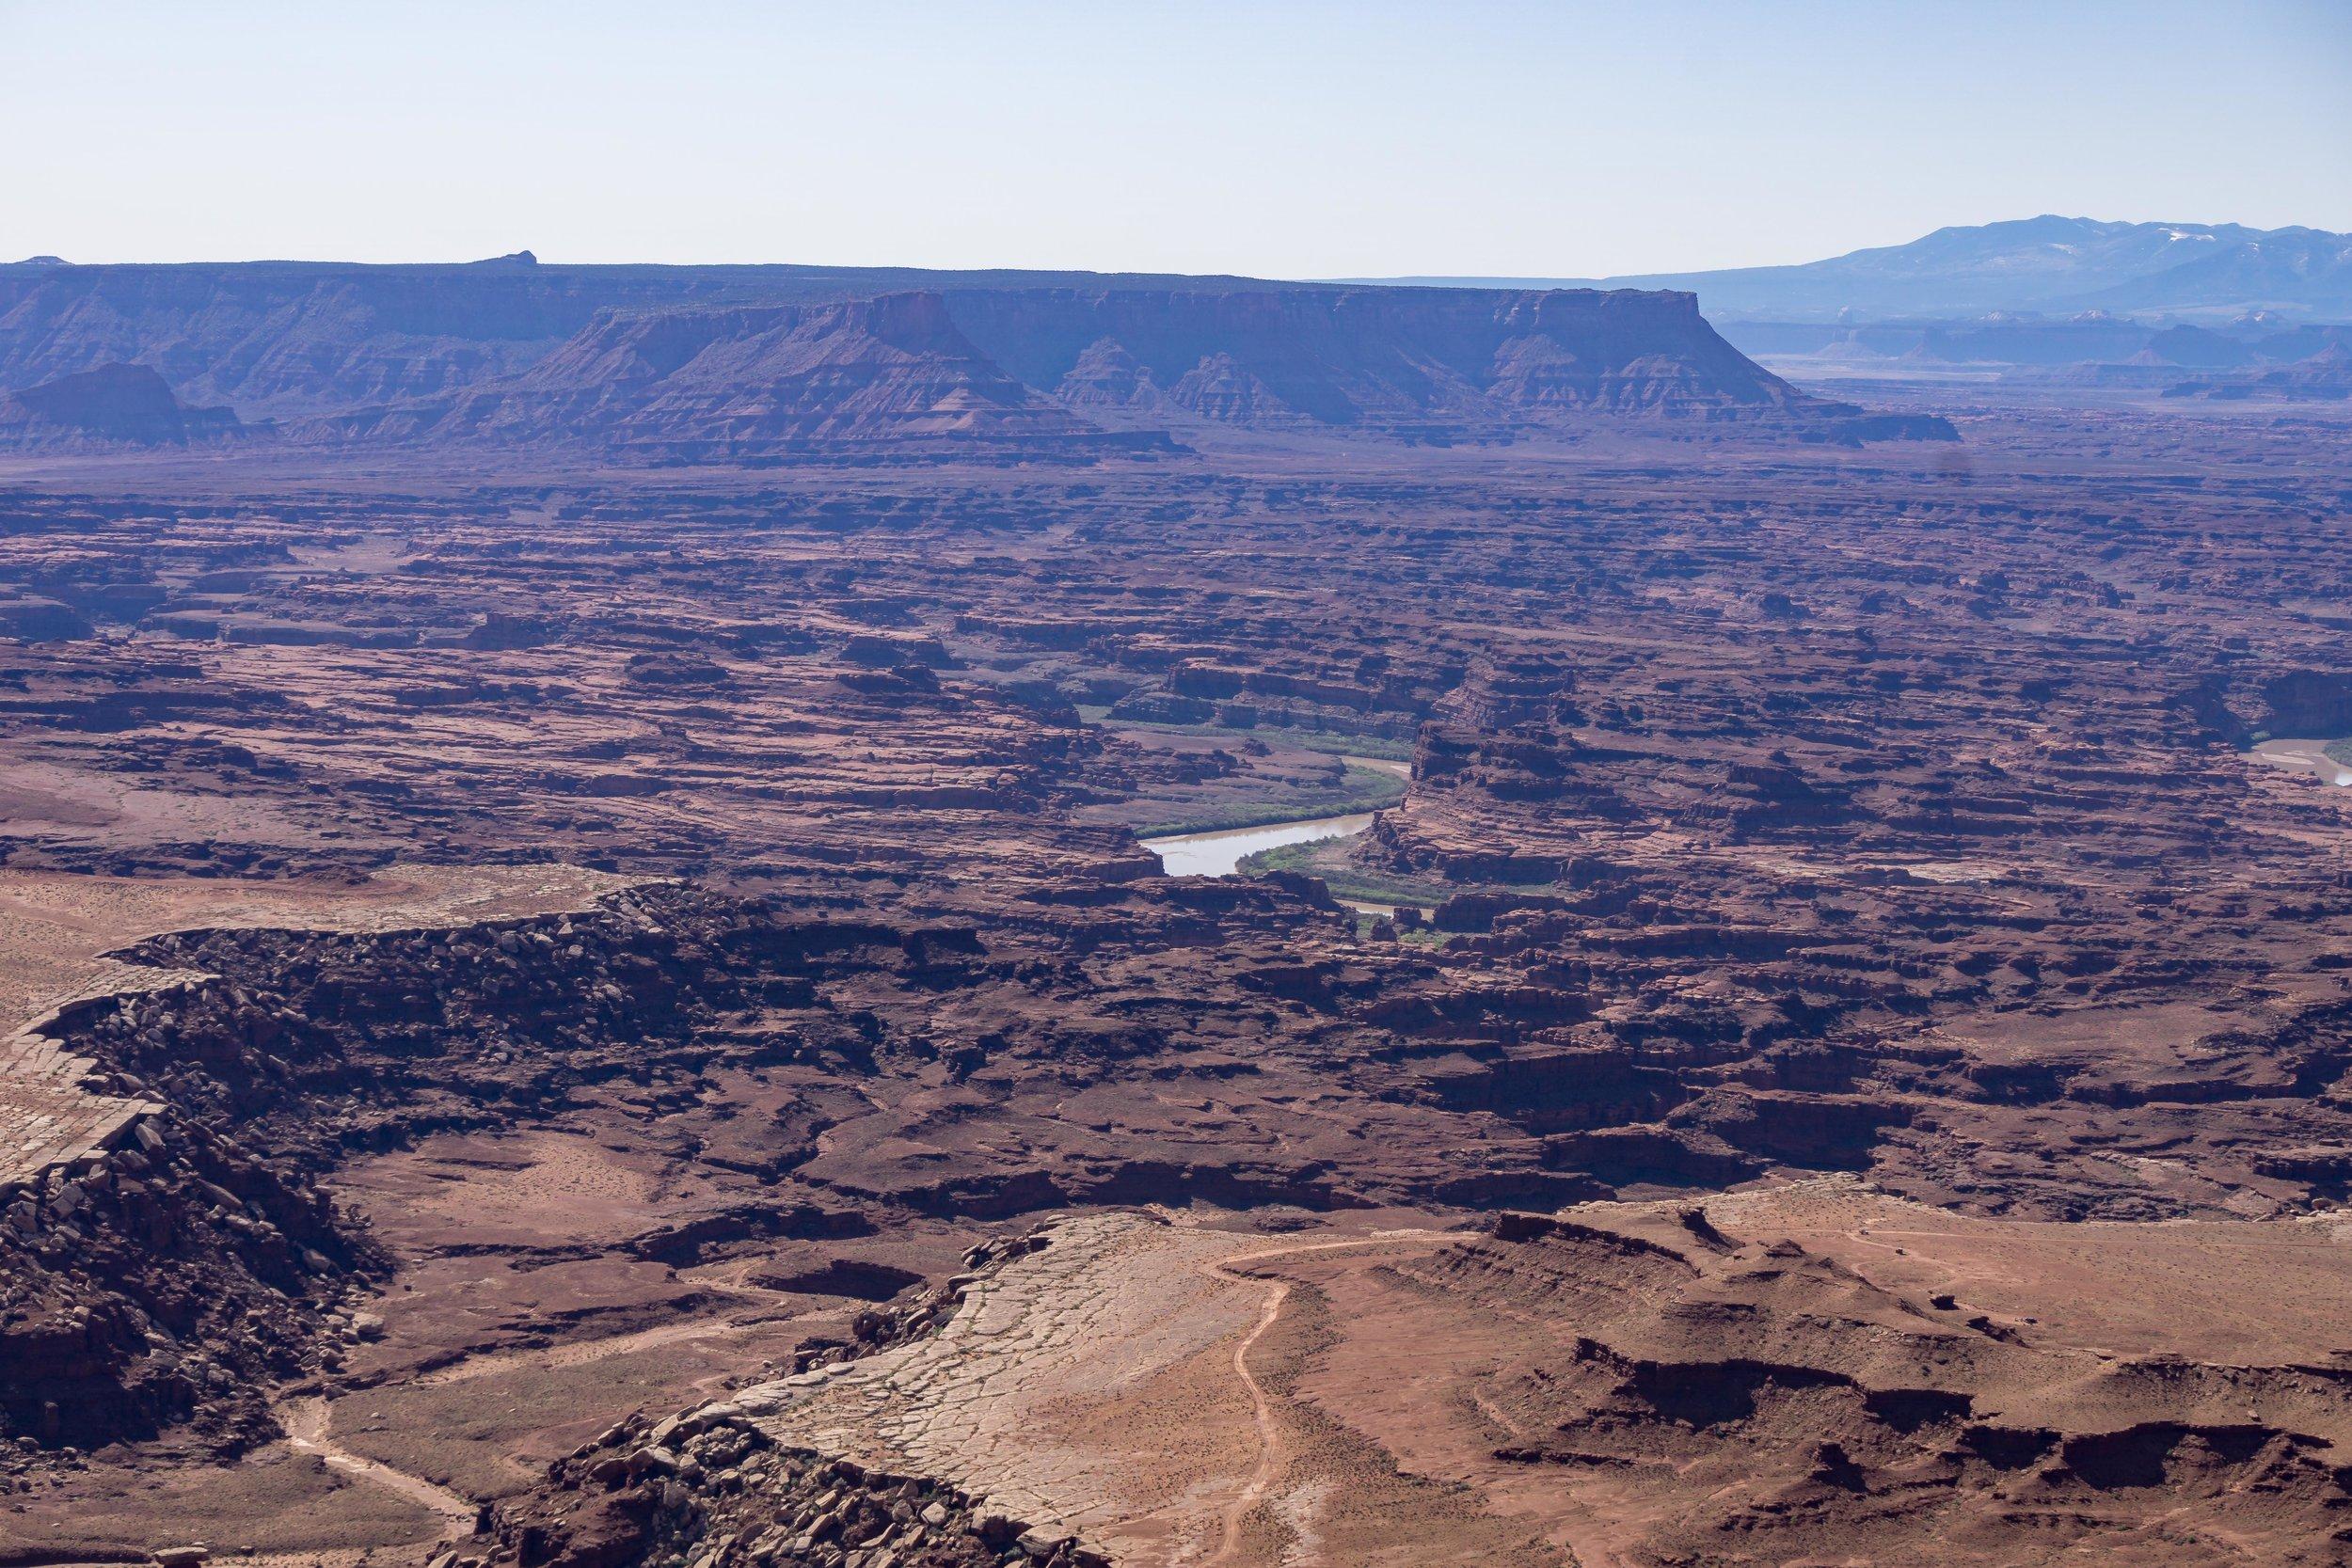 CanyonlandsApril2018-11.jpg